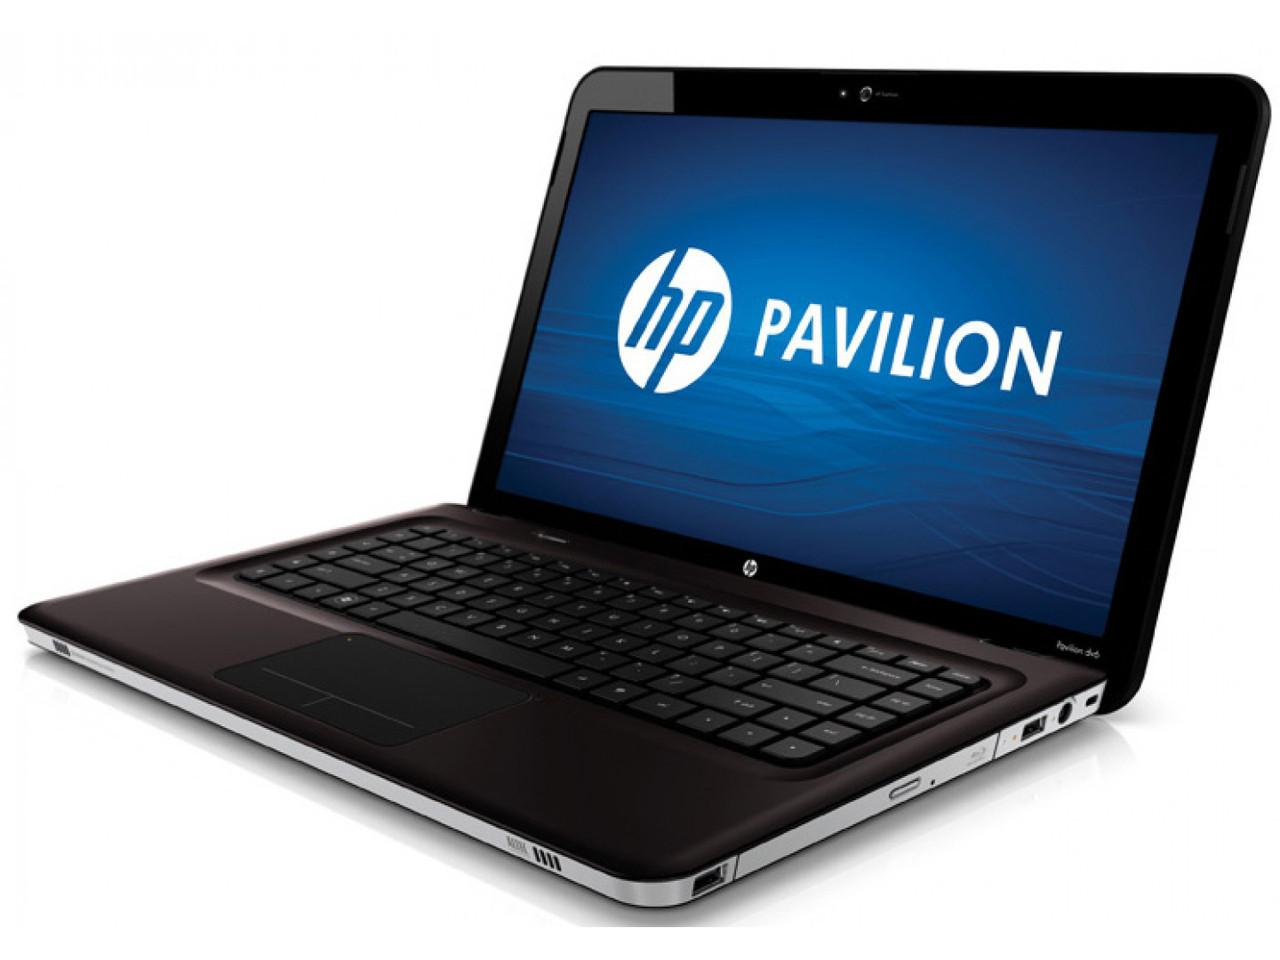 Ноутбук HP Pavilion dv6-2136so-AMD Athlon II M320-2.1GHz-4Gb-DDR2-500Gb-HDD-W15.6-Web-DVD-R-(C-)-Б/У